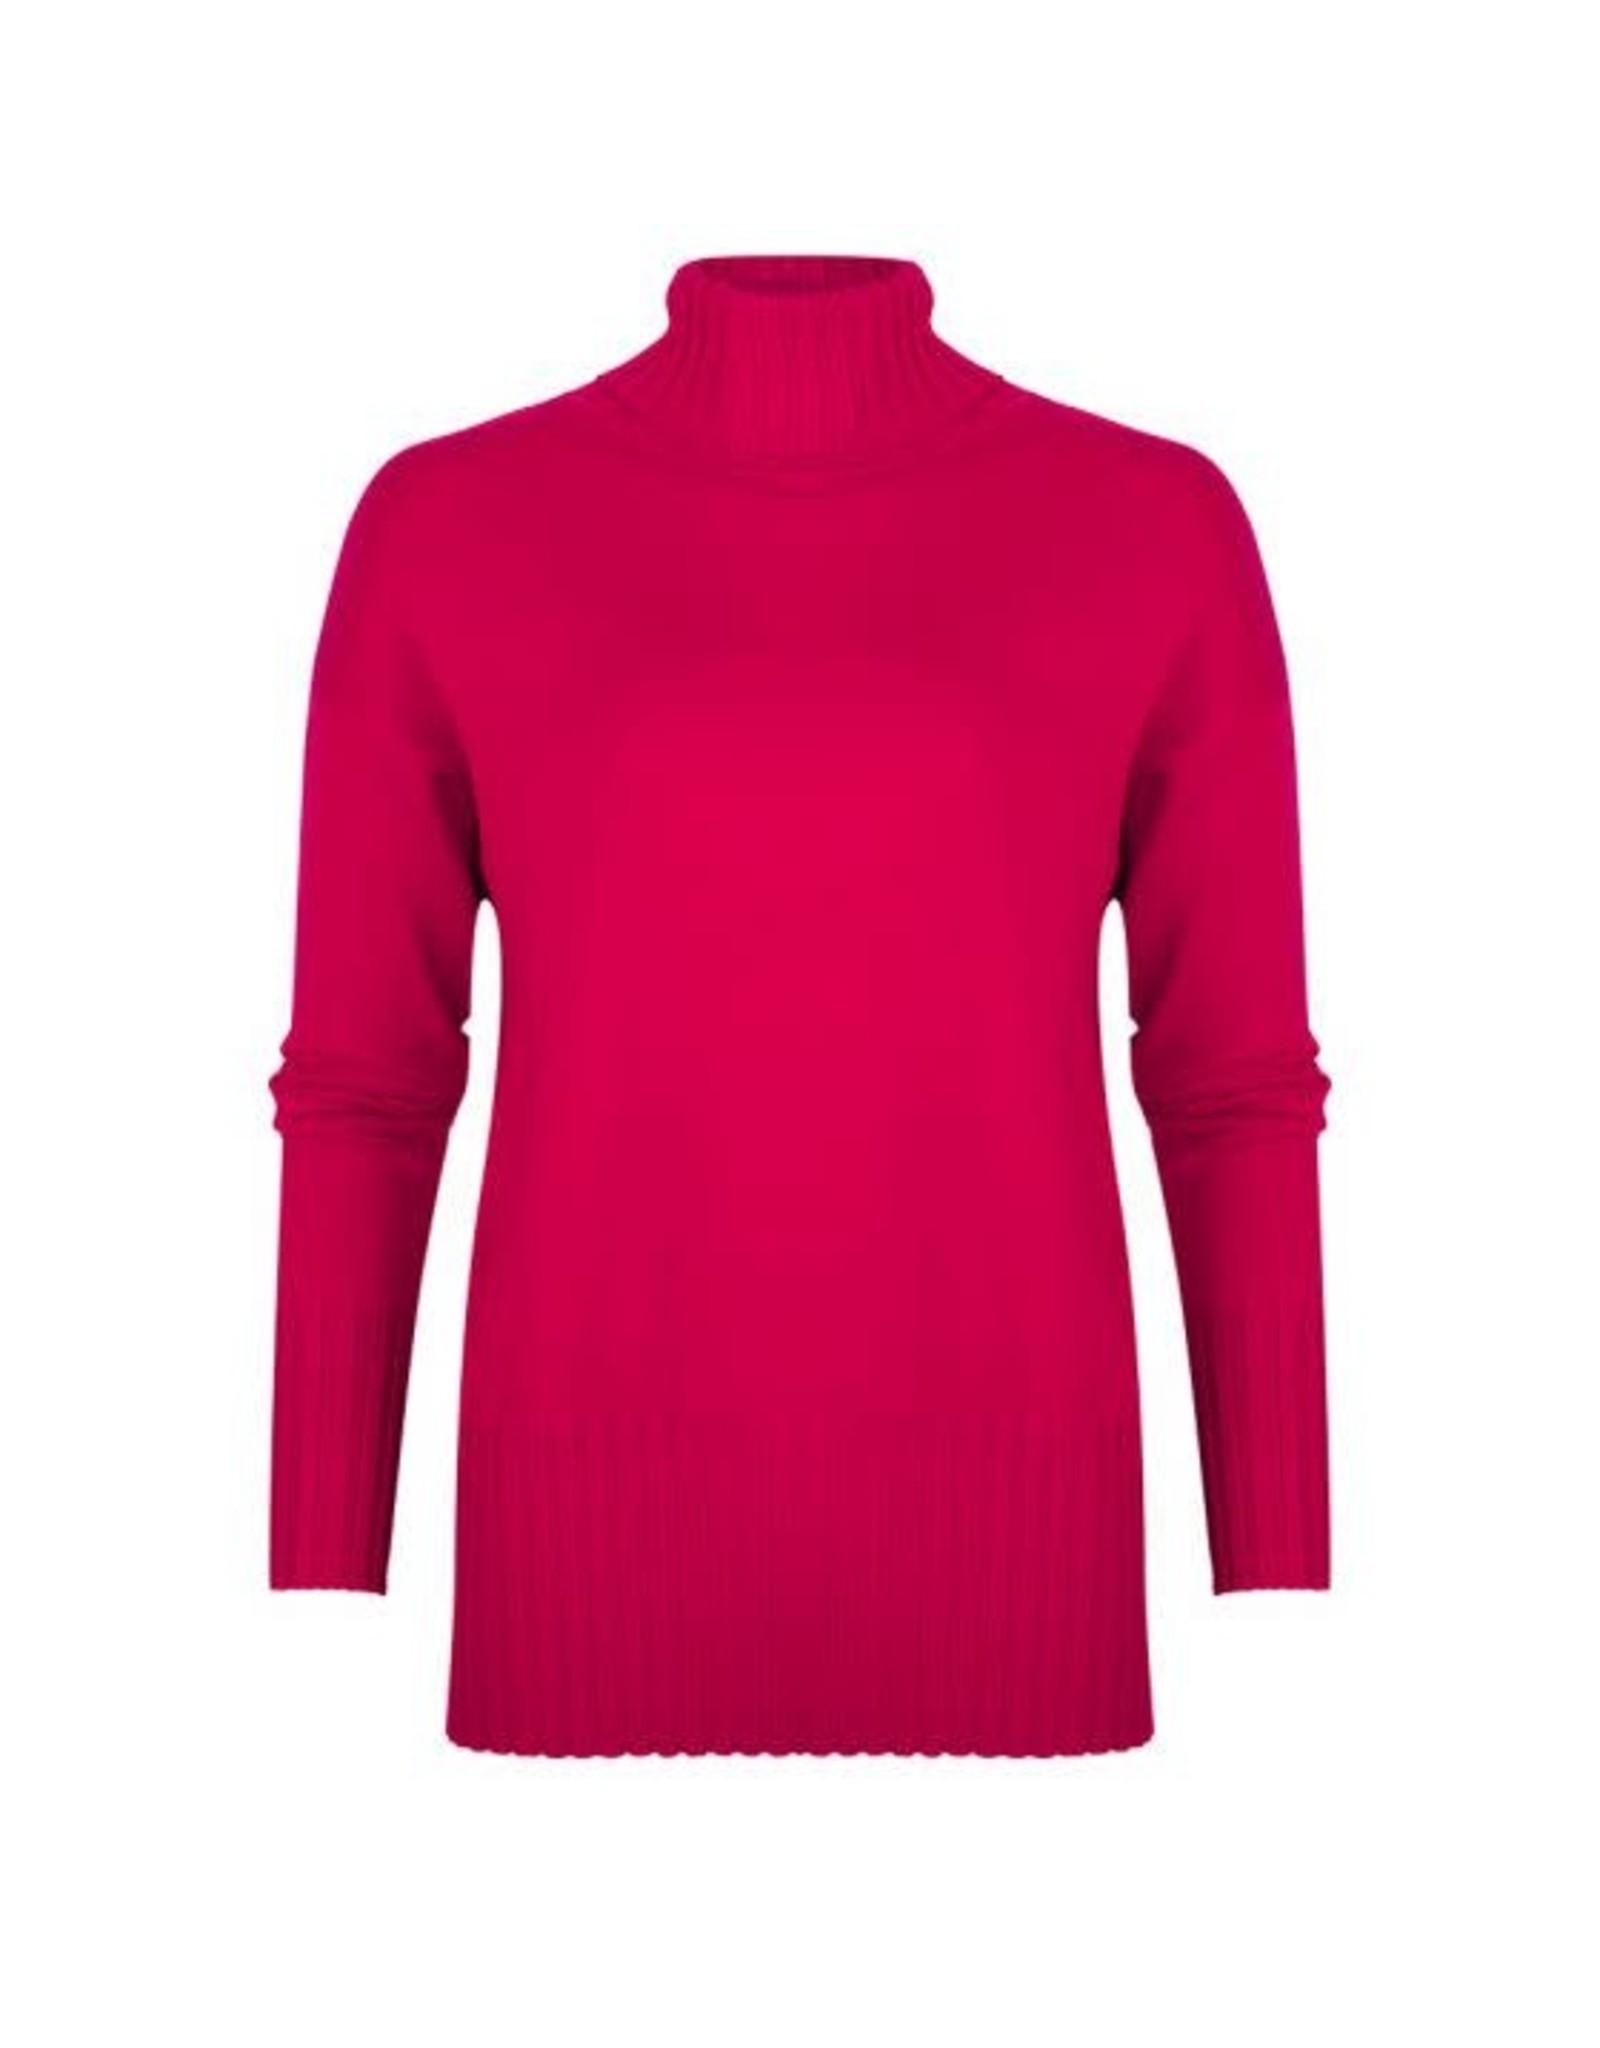 EsQualo EsQualo - Sweater with ribbed hem and cuffs (fuchsia)